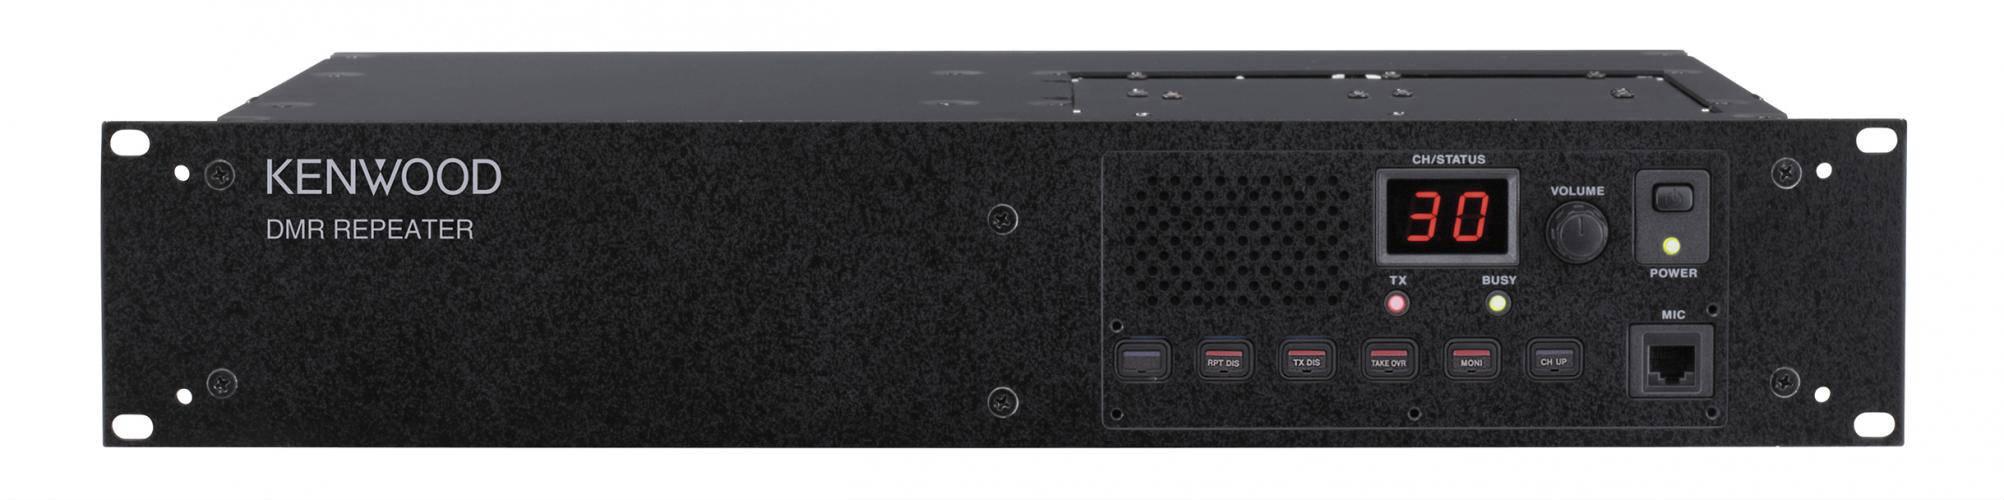 KENWOOD TKR-710/TKR-810E DIGITAL REPEATER